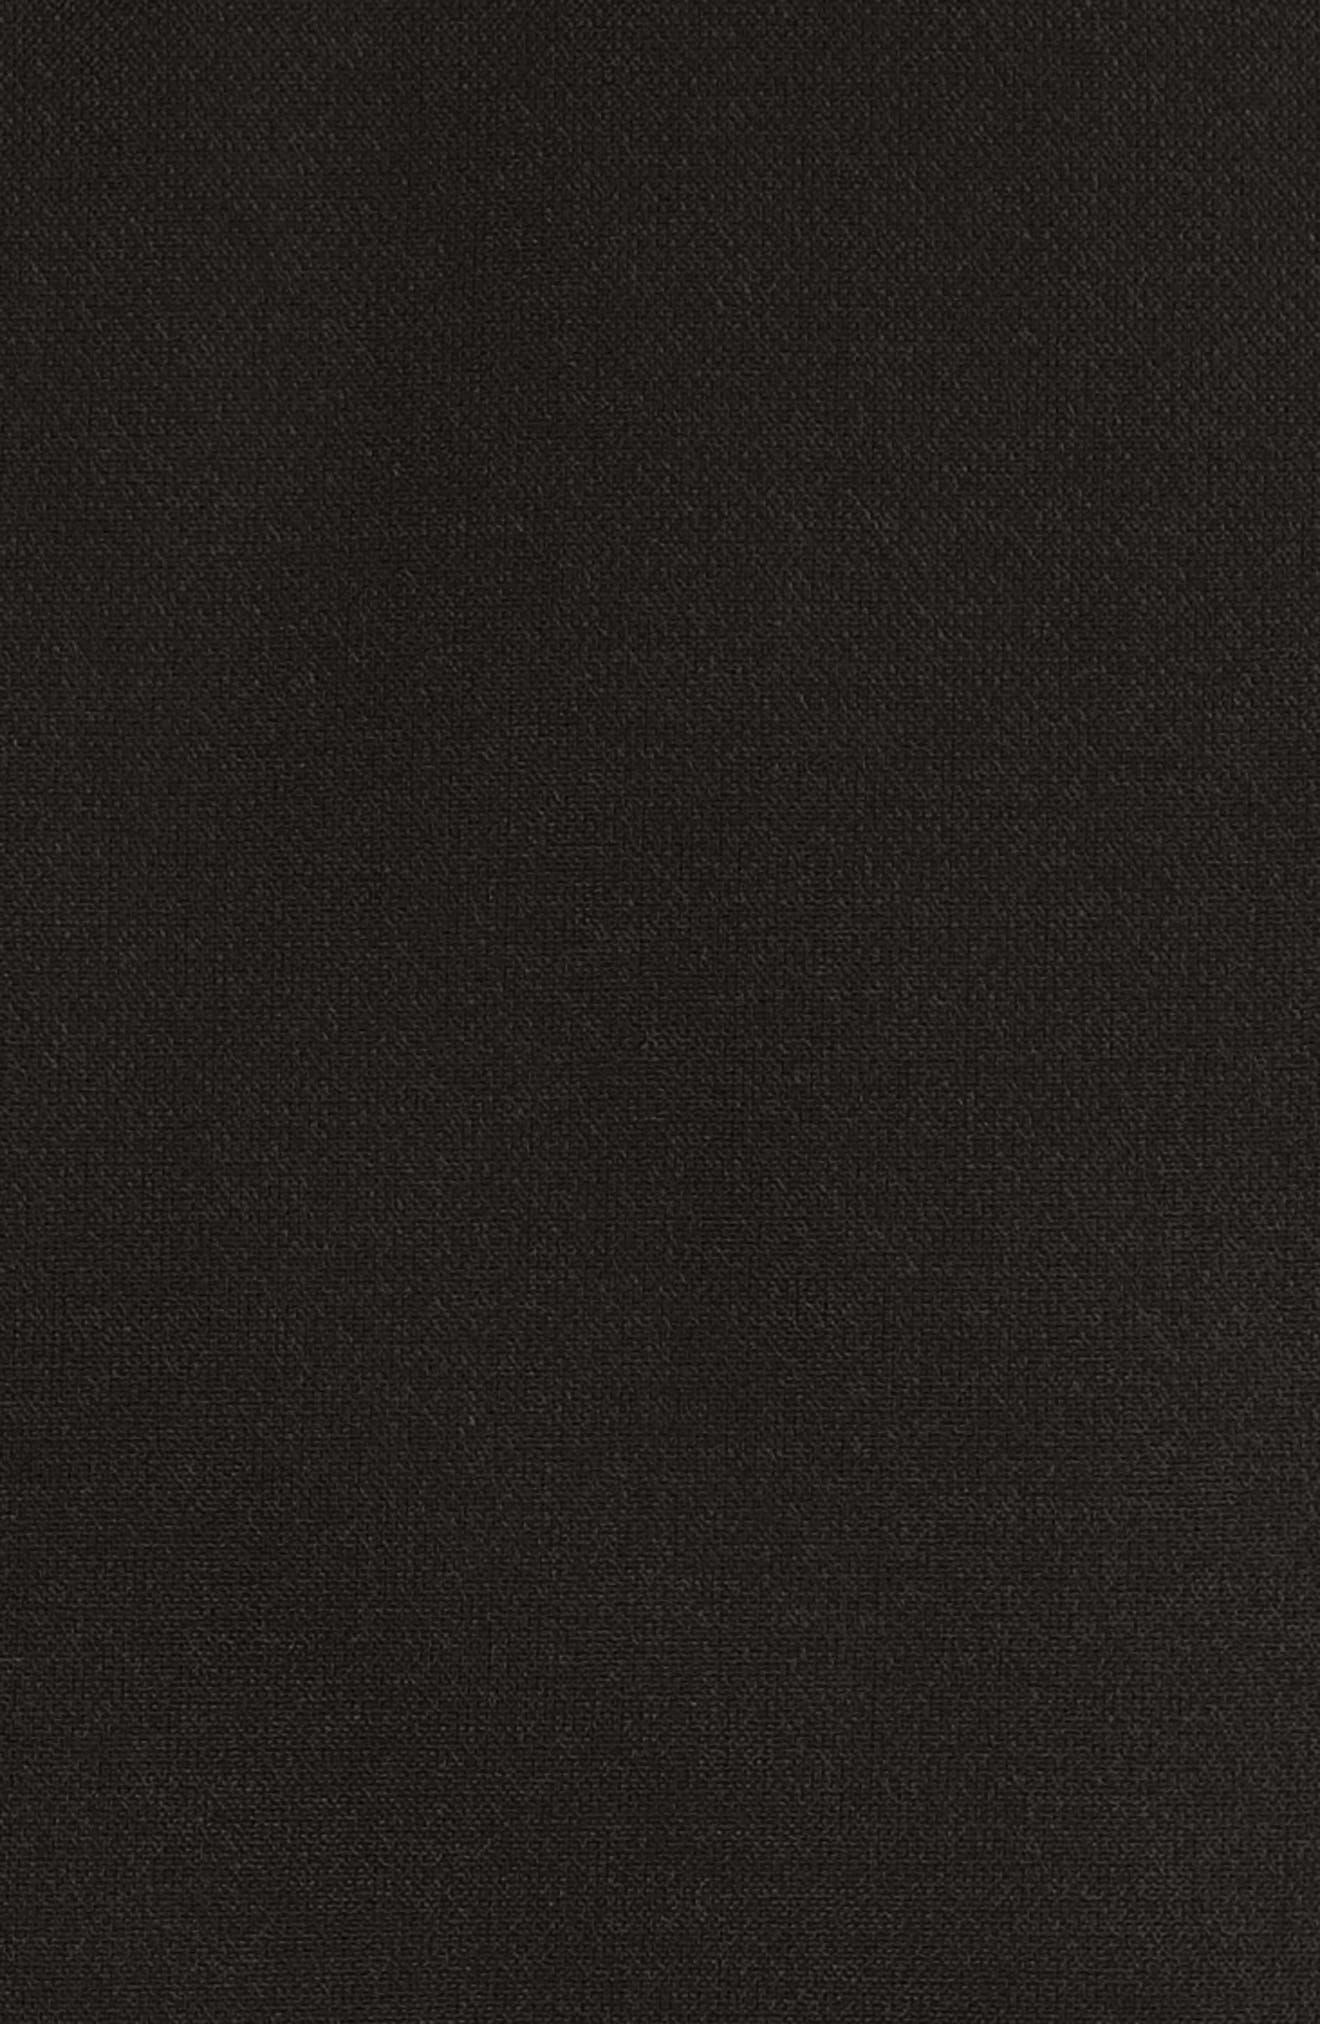 Stretch Cady Sheath Dress,                             Alternate thumbnail 6, color,                             001